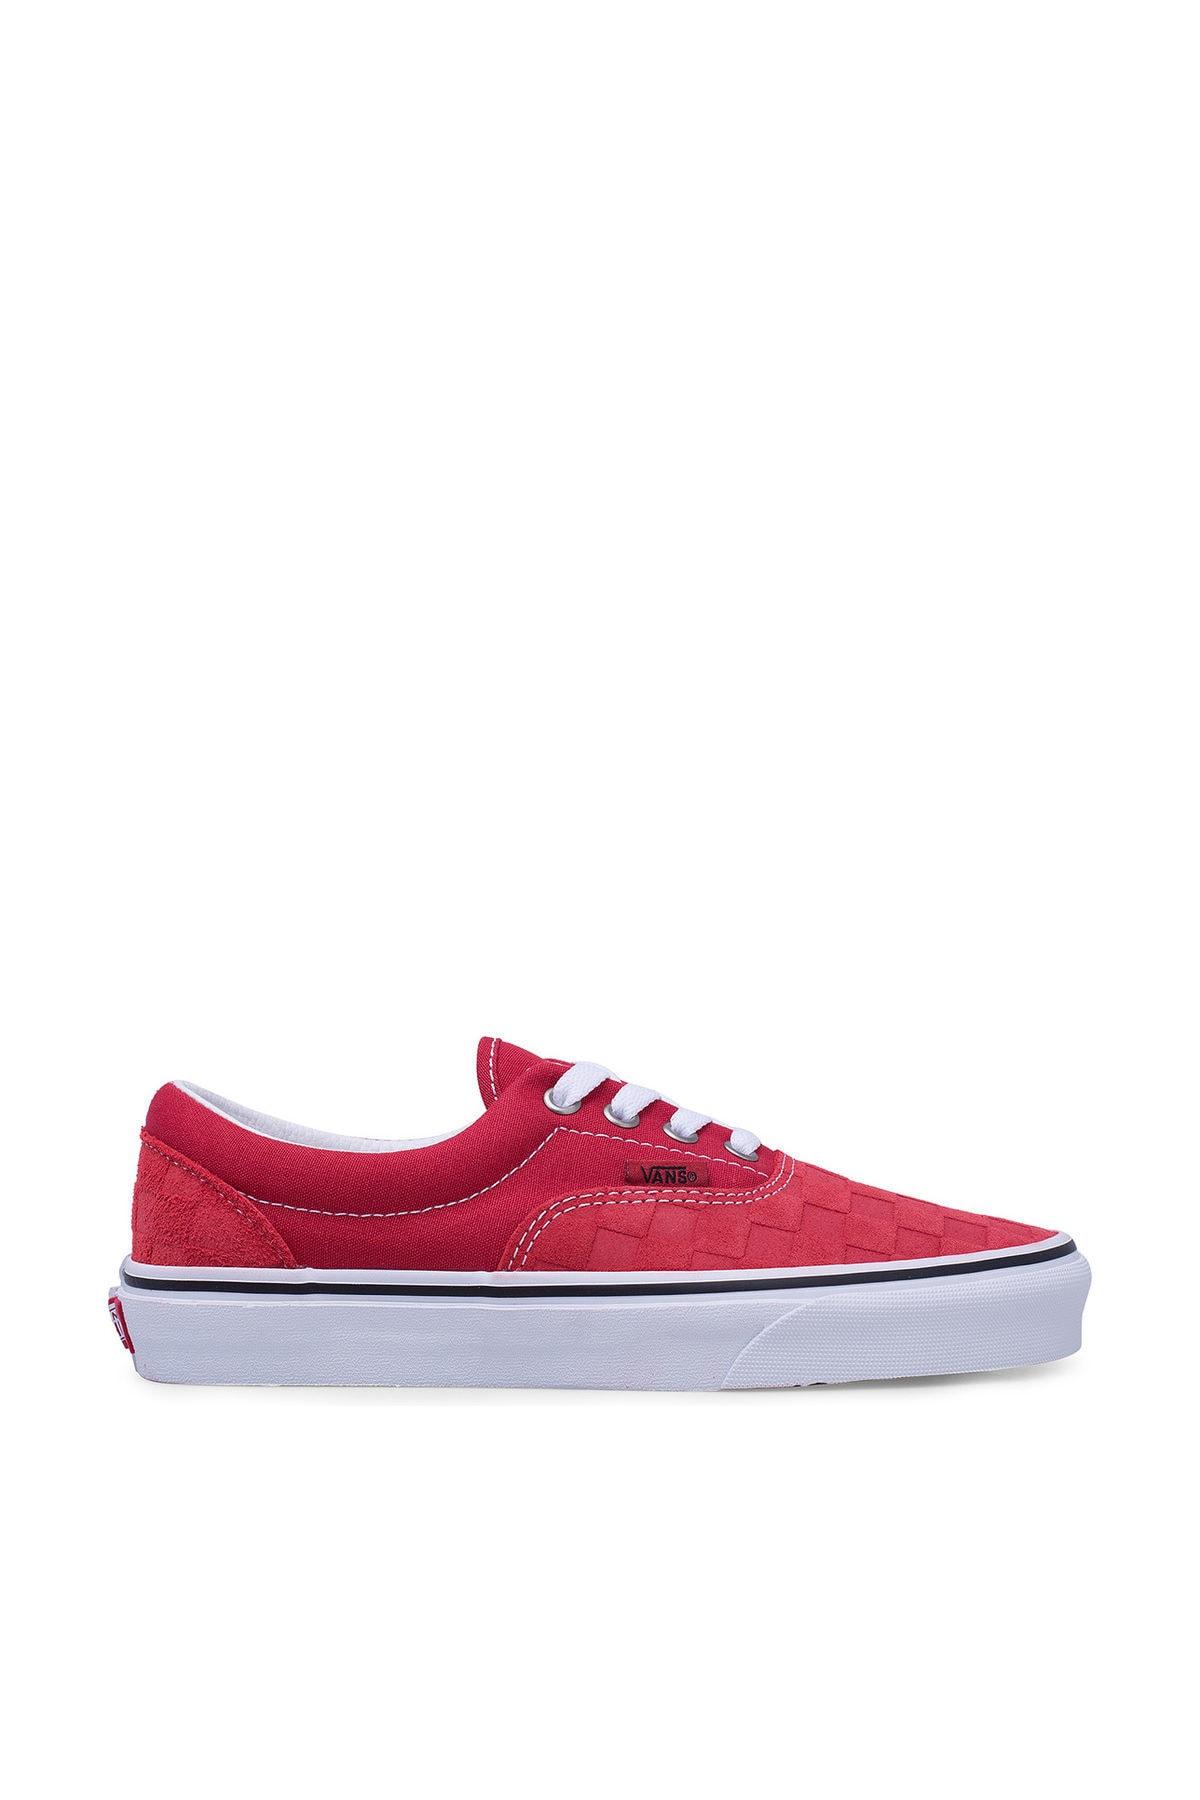 Vans Kırmızı Unisex Sneaker VN0A4U39WJ21 1